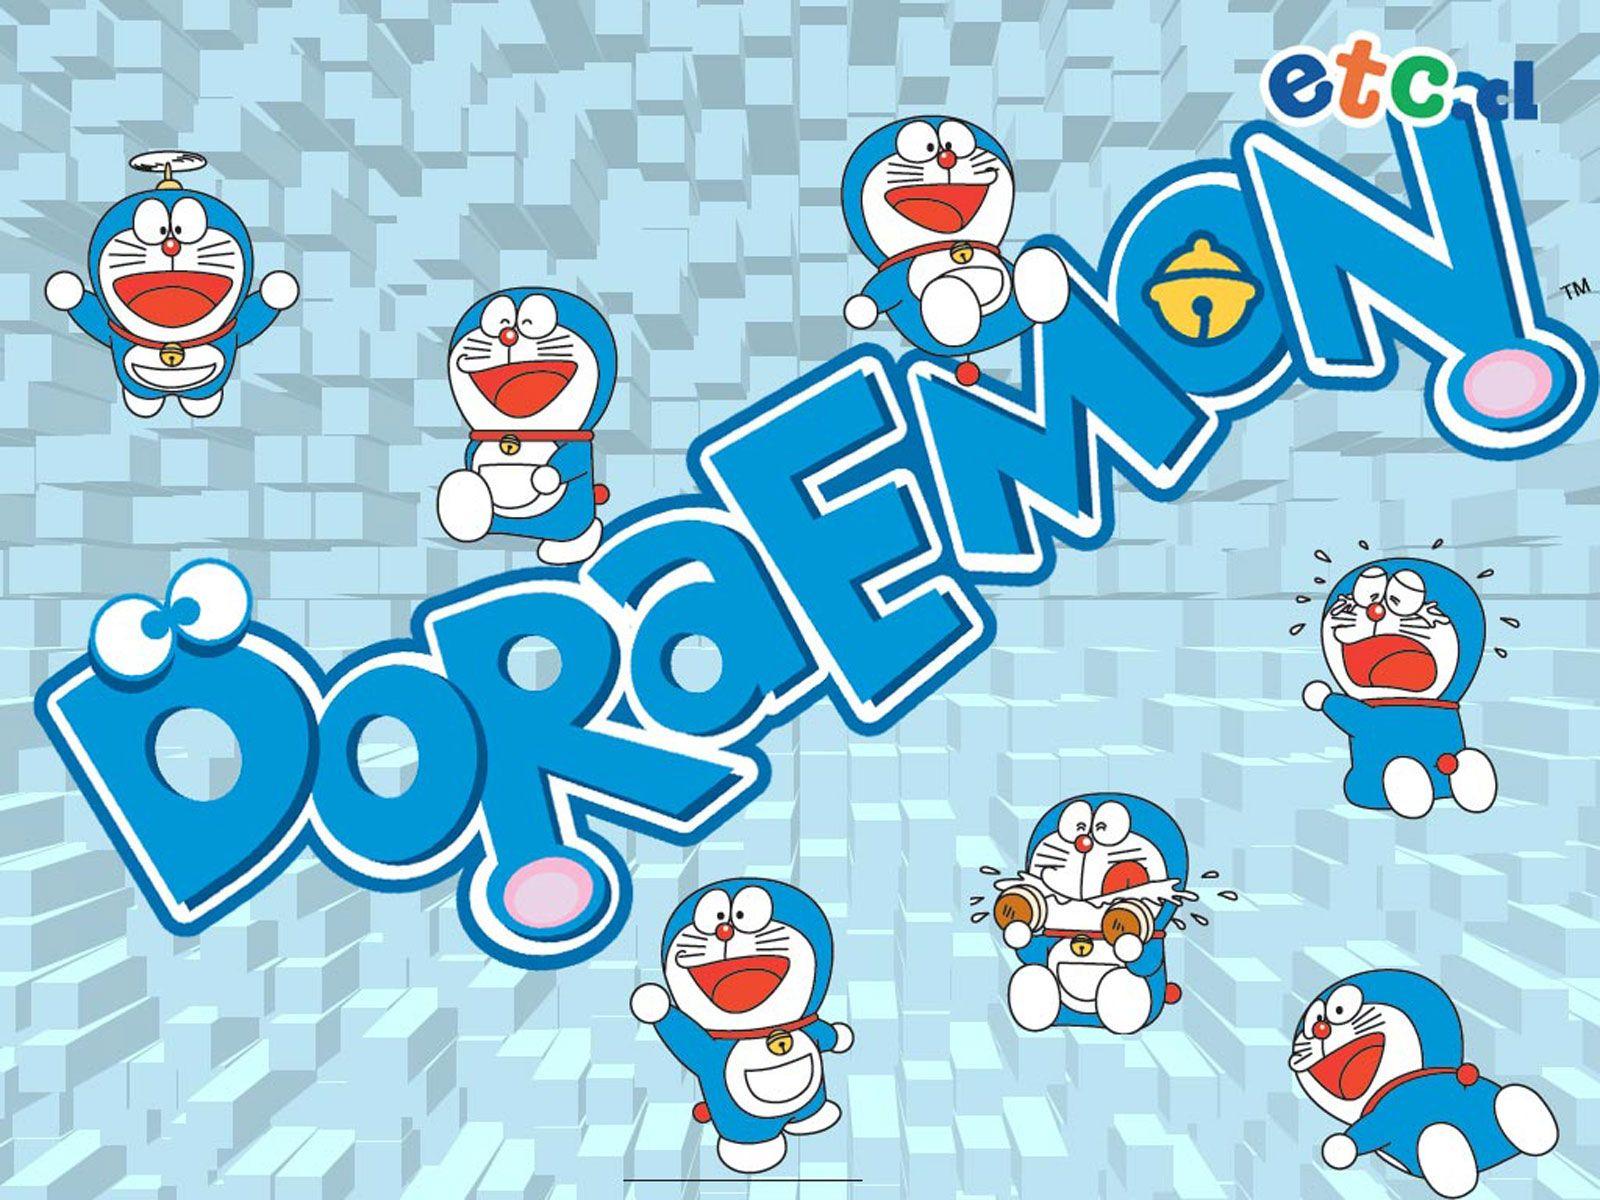 Amazing Doraemon Wallpaper HD - Wallpaper - Amazing Photo Gallery